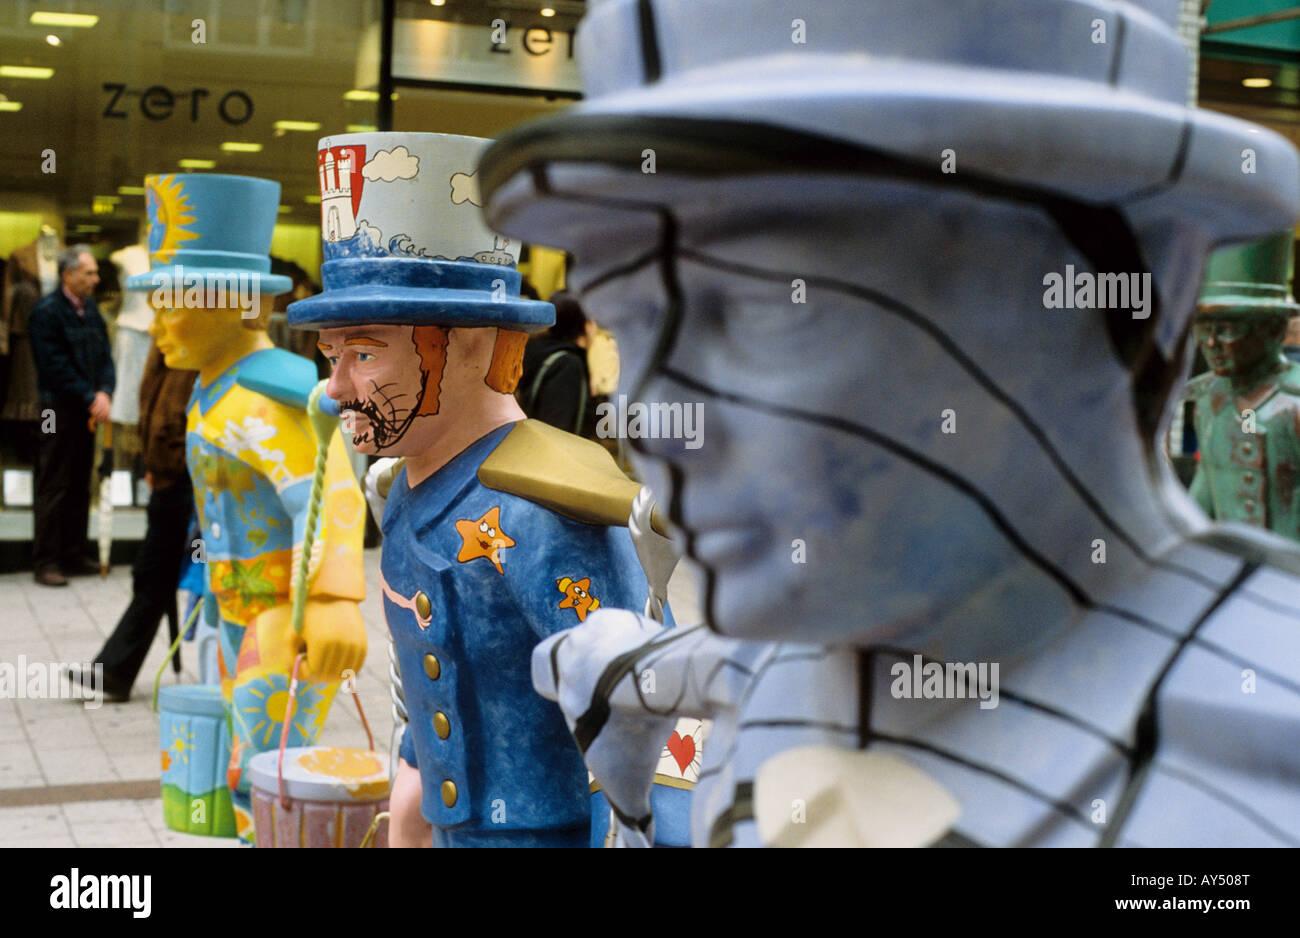 Hans Hummel figures, Hamburg, Germany - Stock Image